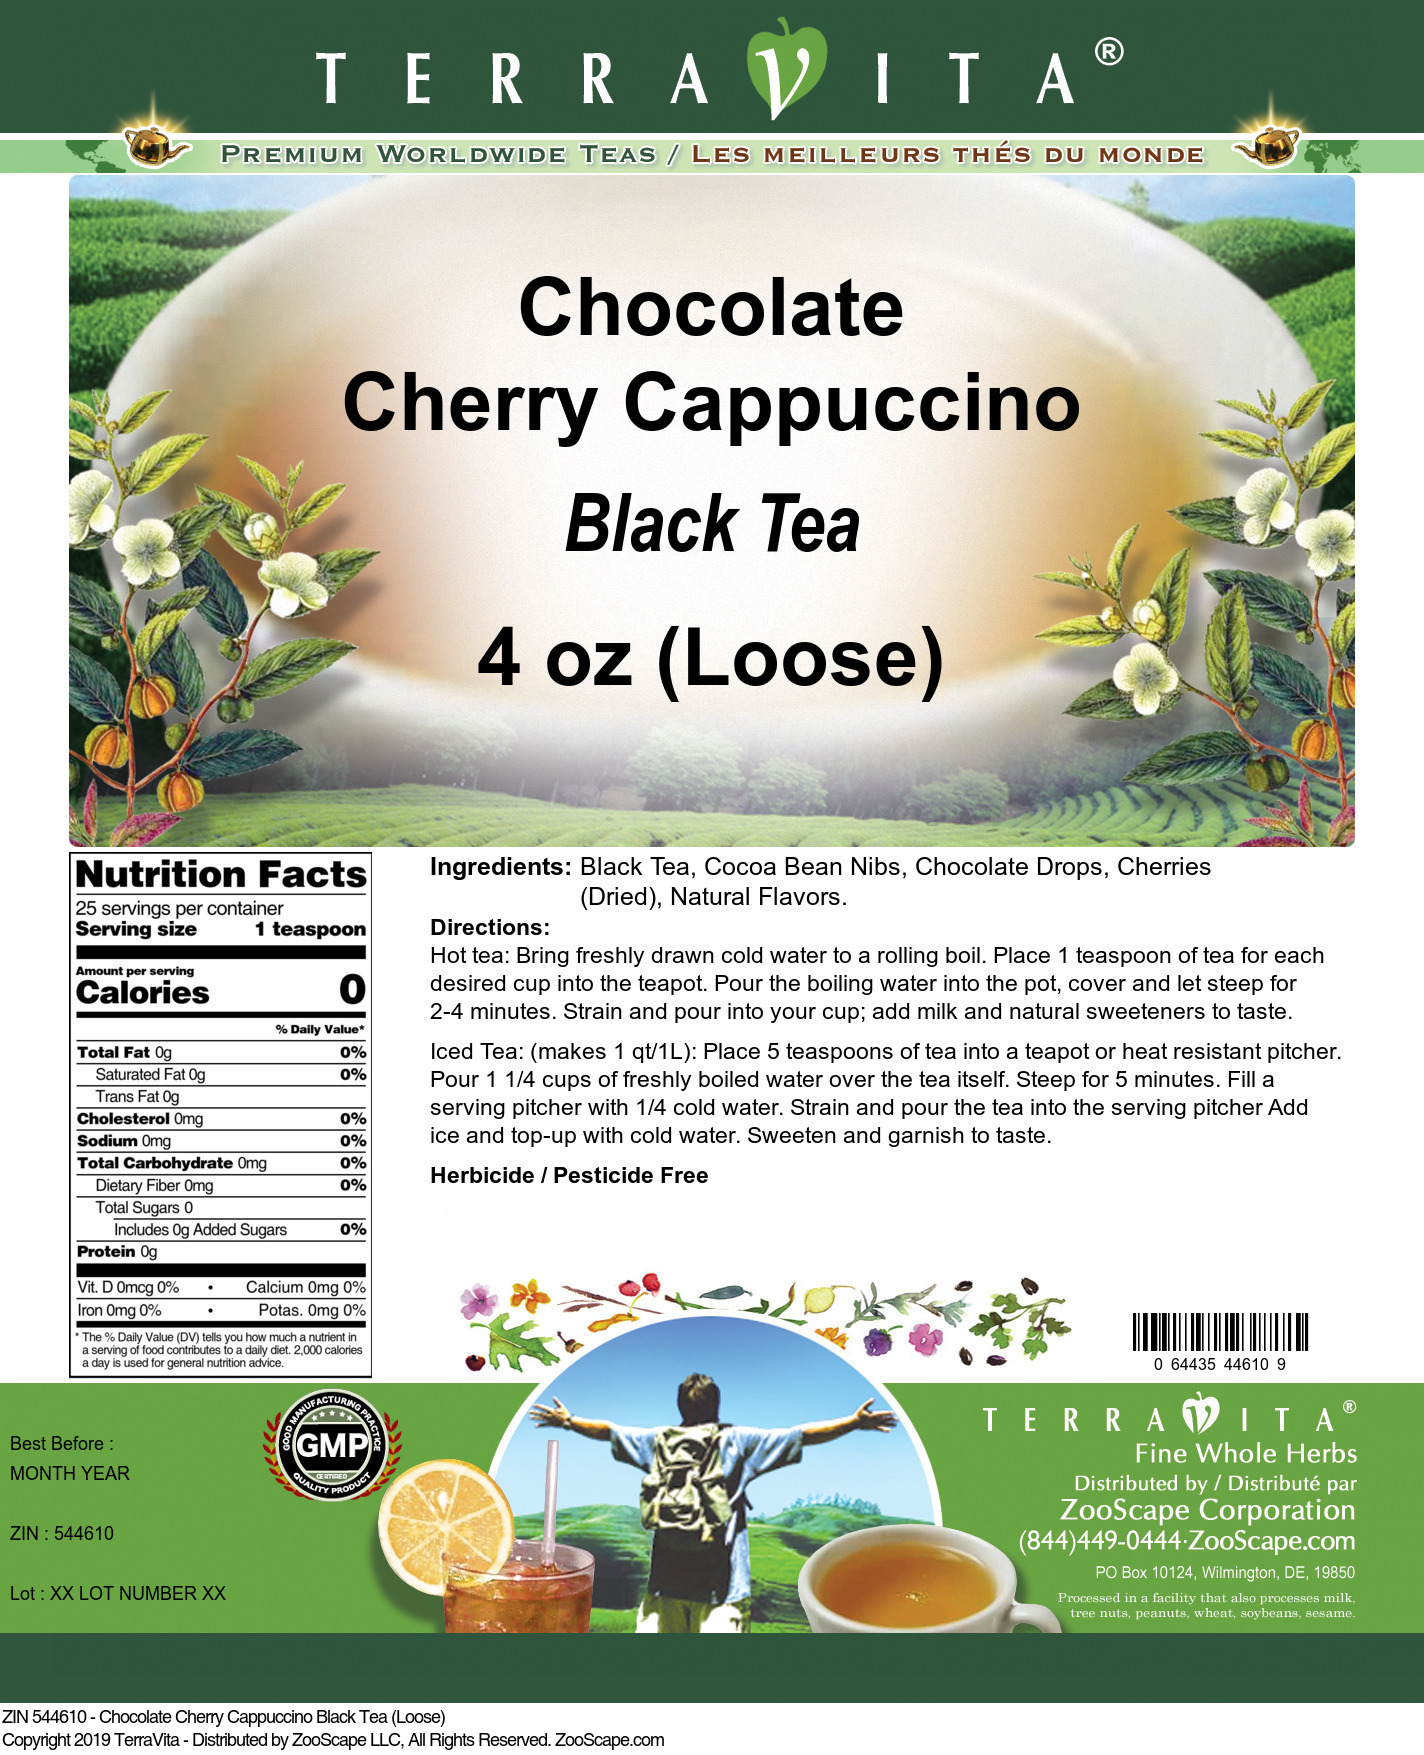 Chocolate Cherry Cappuccino Black Tea (Loose)